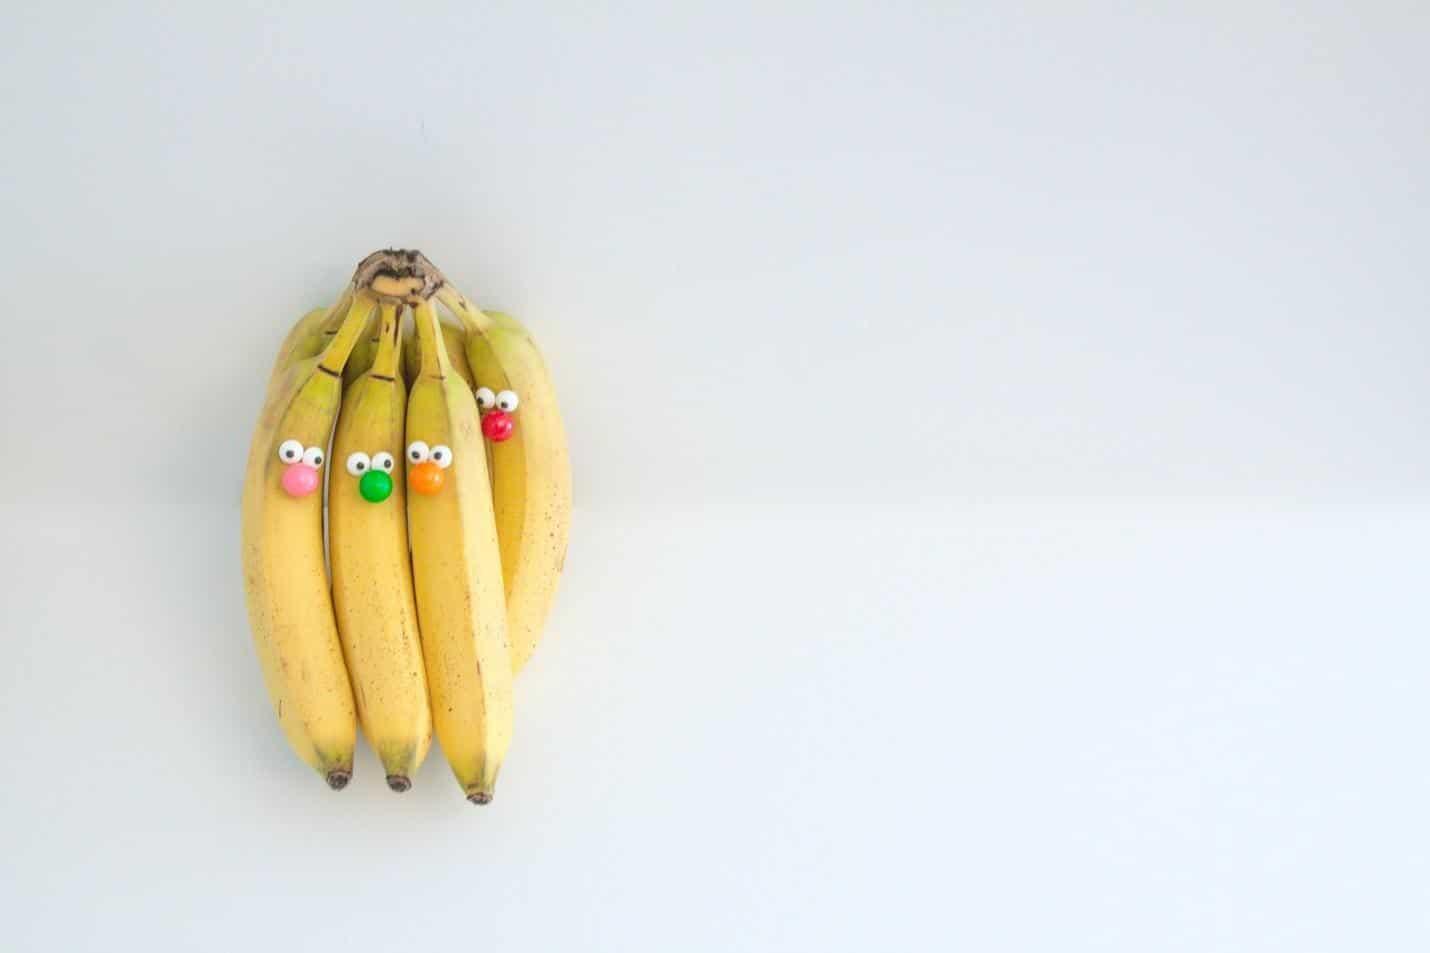 Plantains vs Bananas